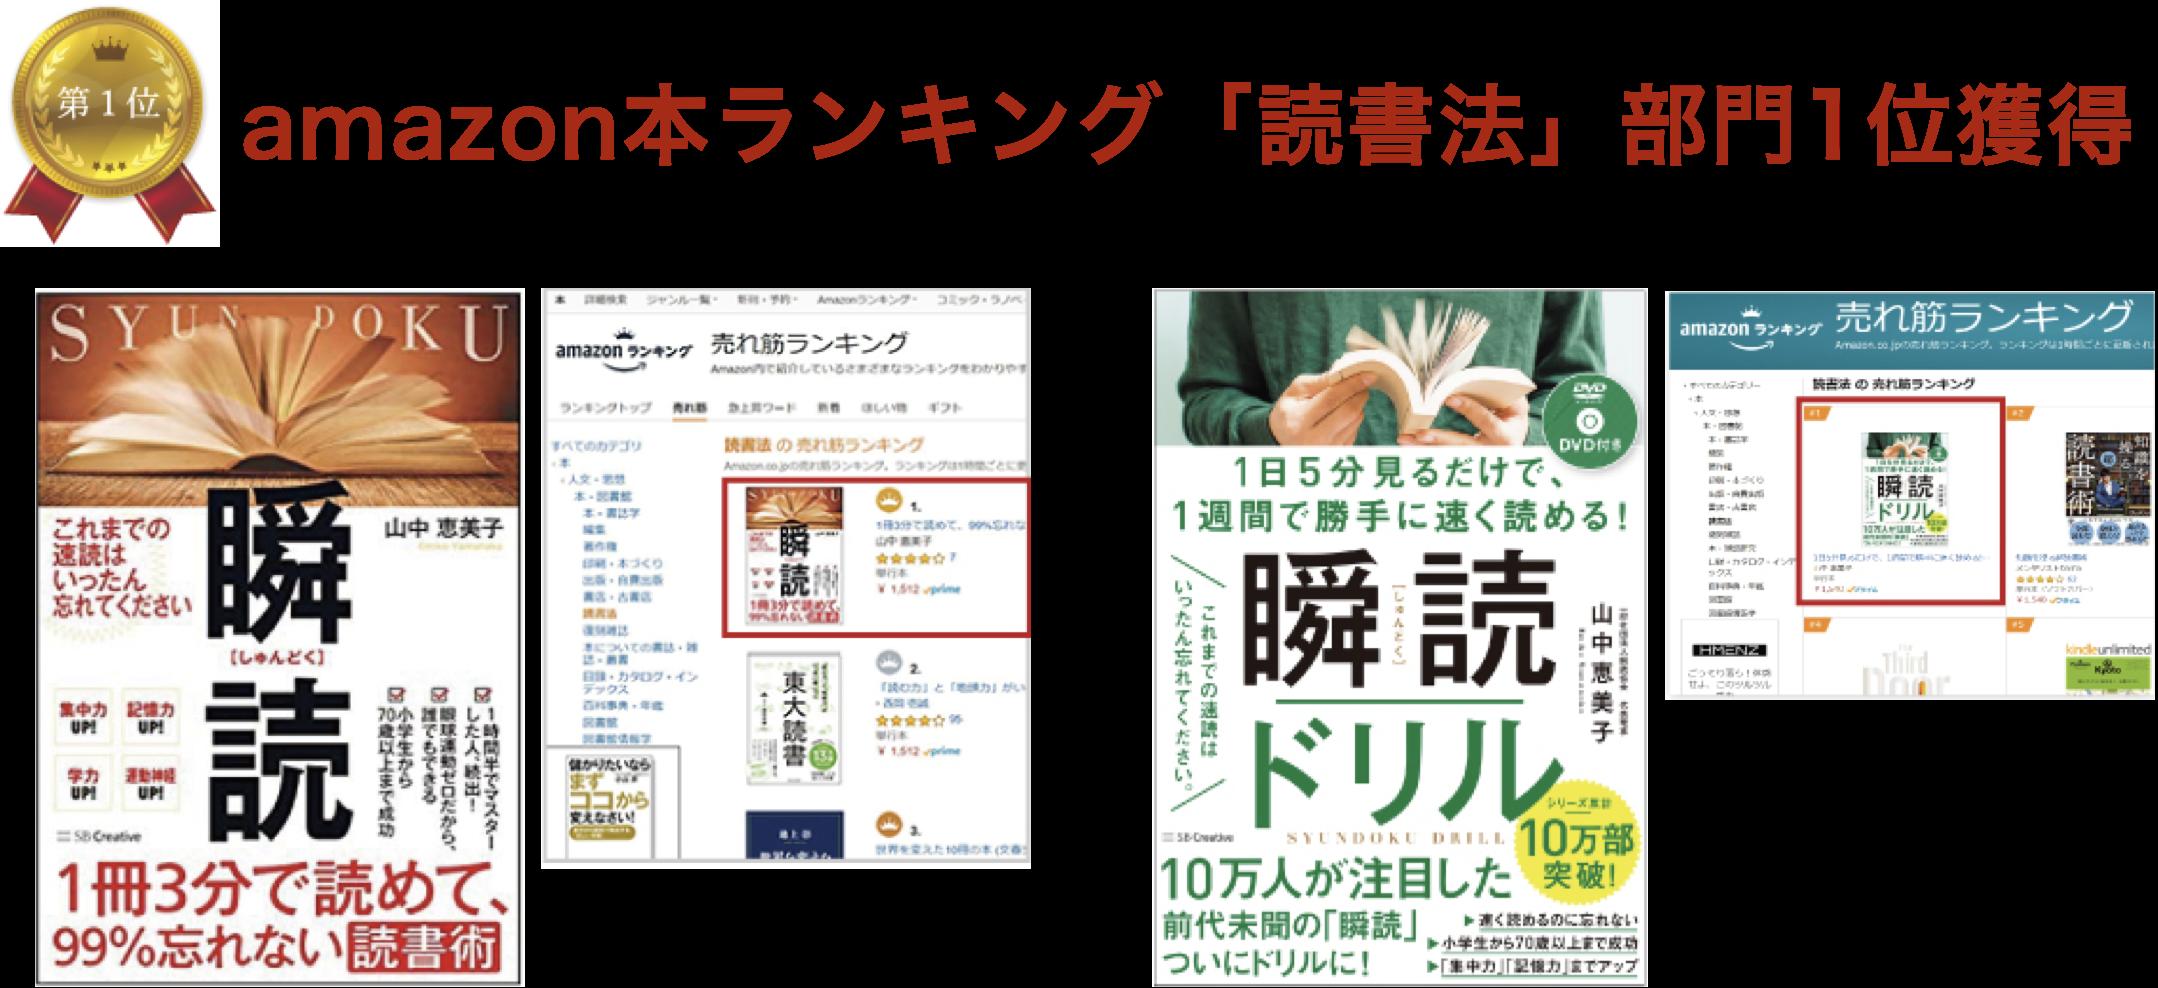 amazon本ランキング「読書法」部門1位獲得